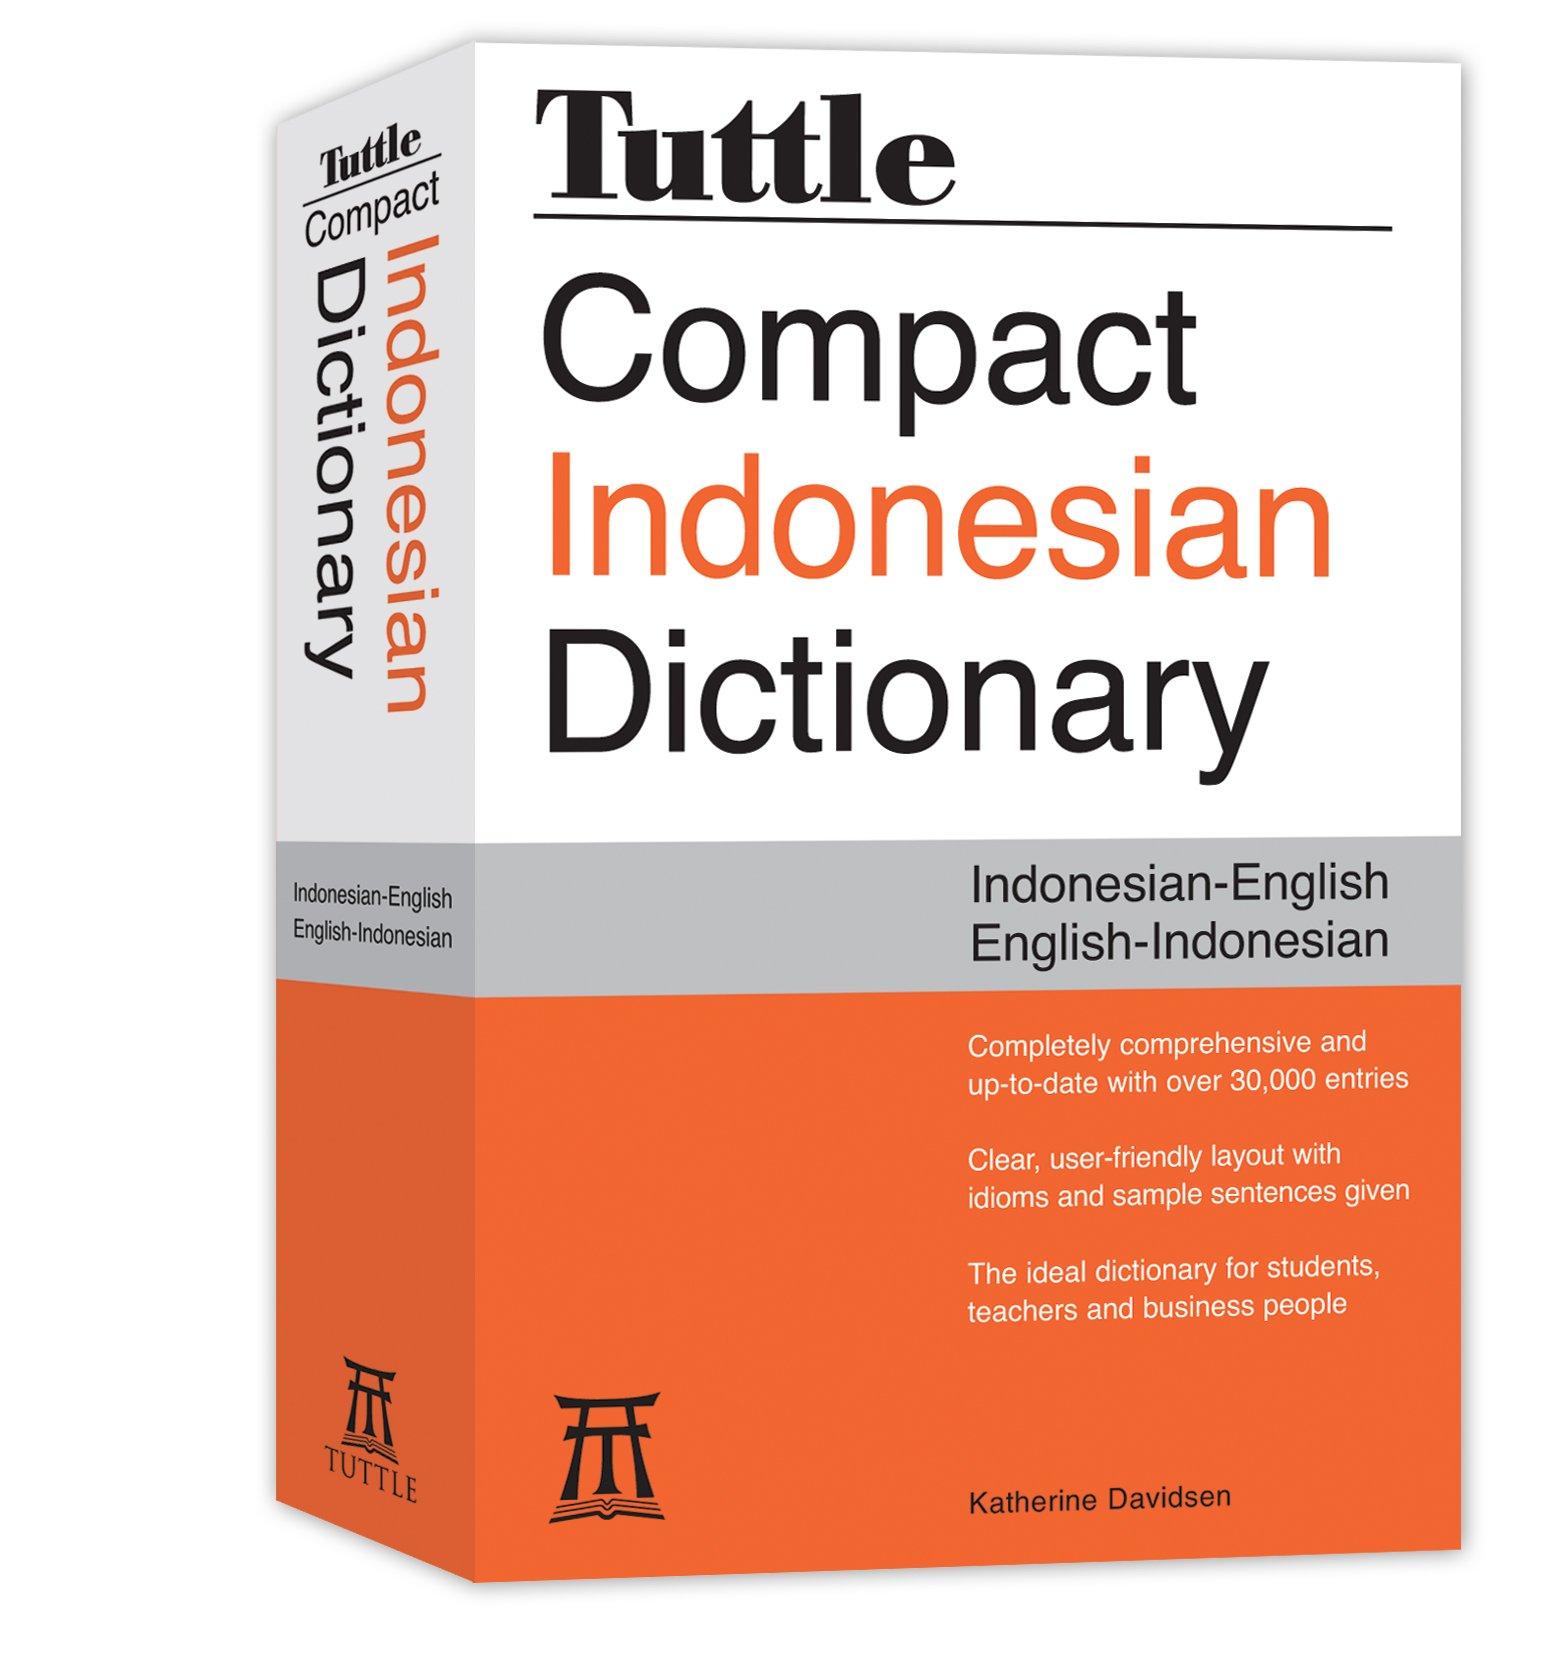 Tuttle Compact Indonesian Dictionary: Indonesian-English English-Indonesian:  Katherine Davidsen: 9780804837408: Amazon.com: Books